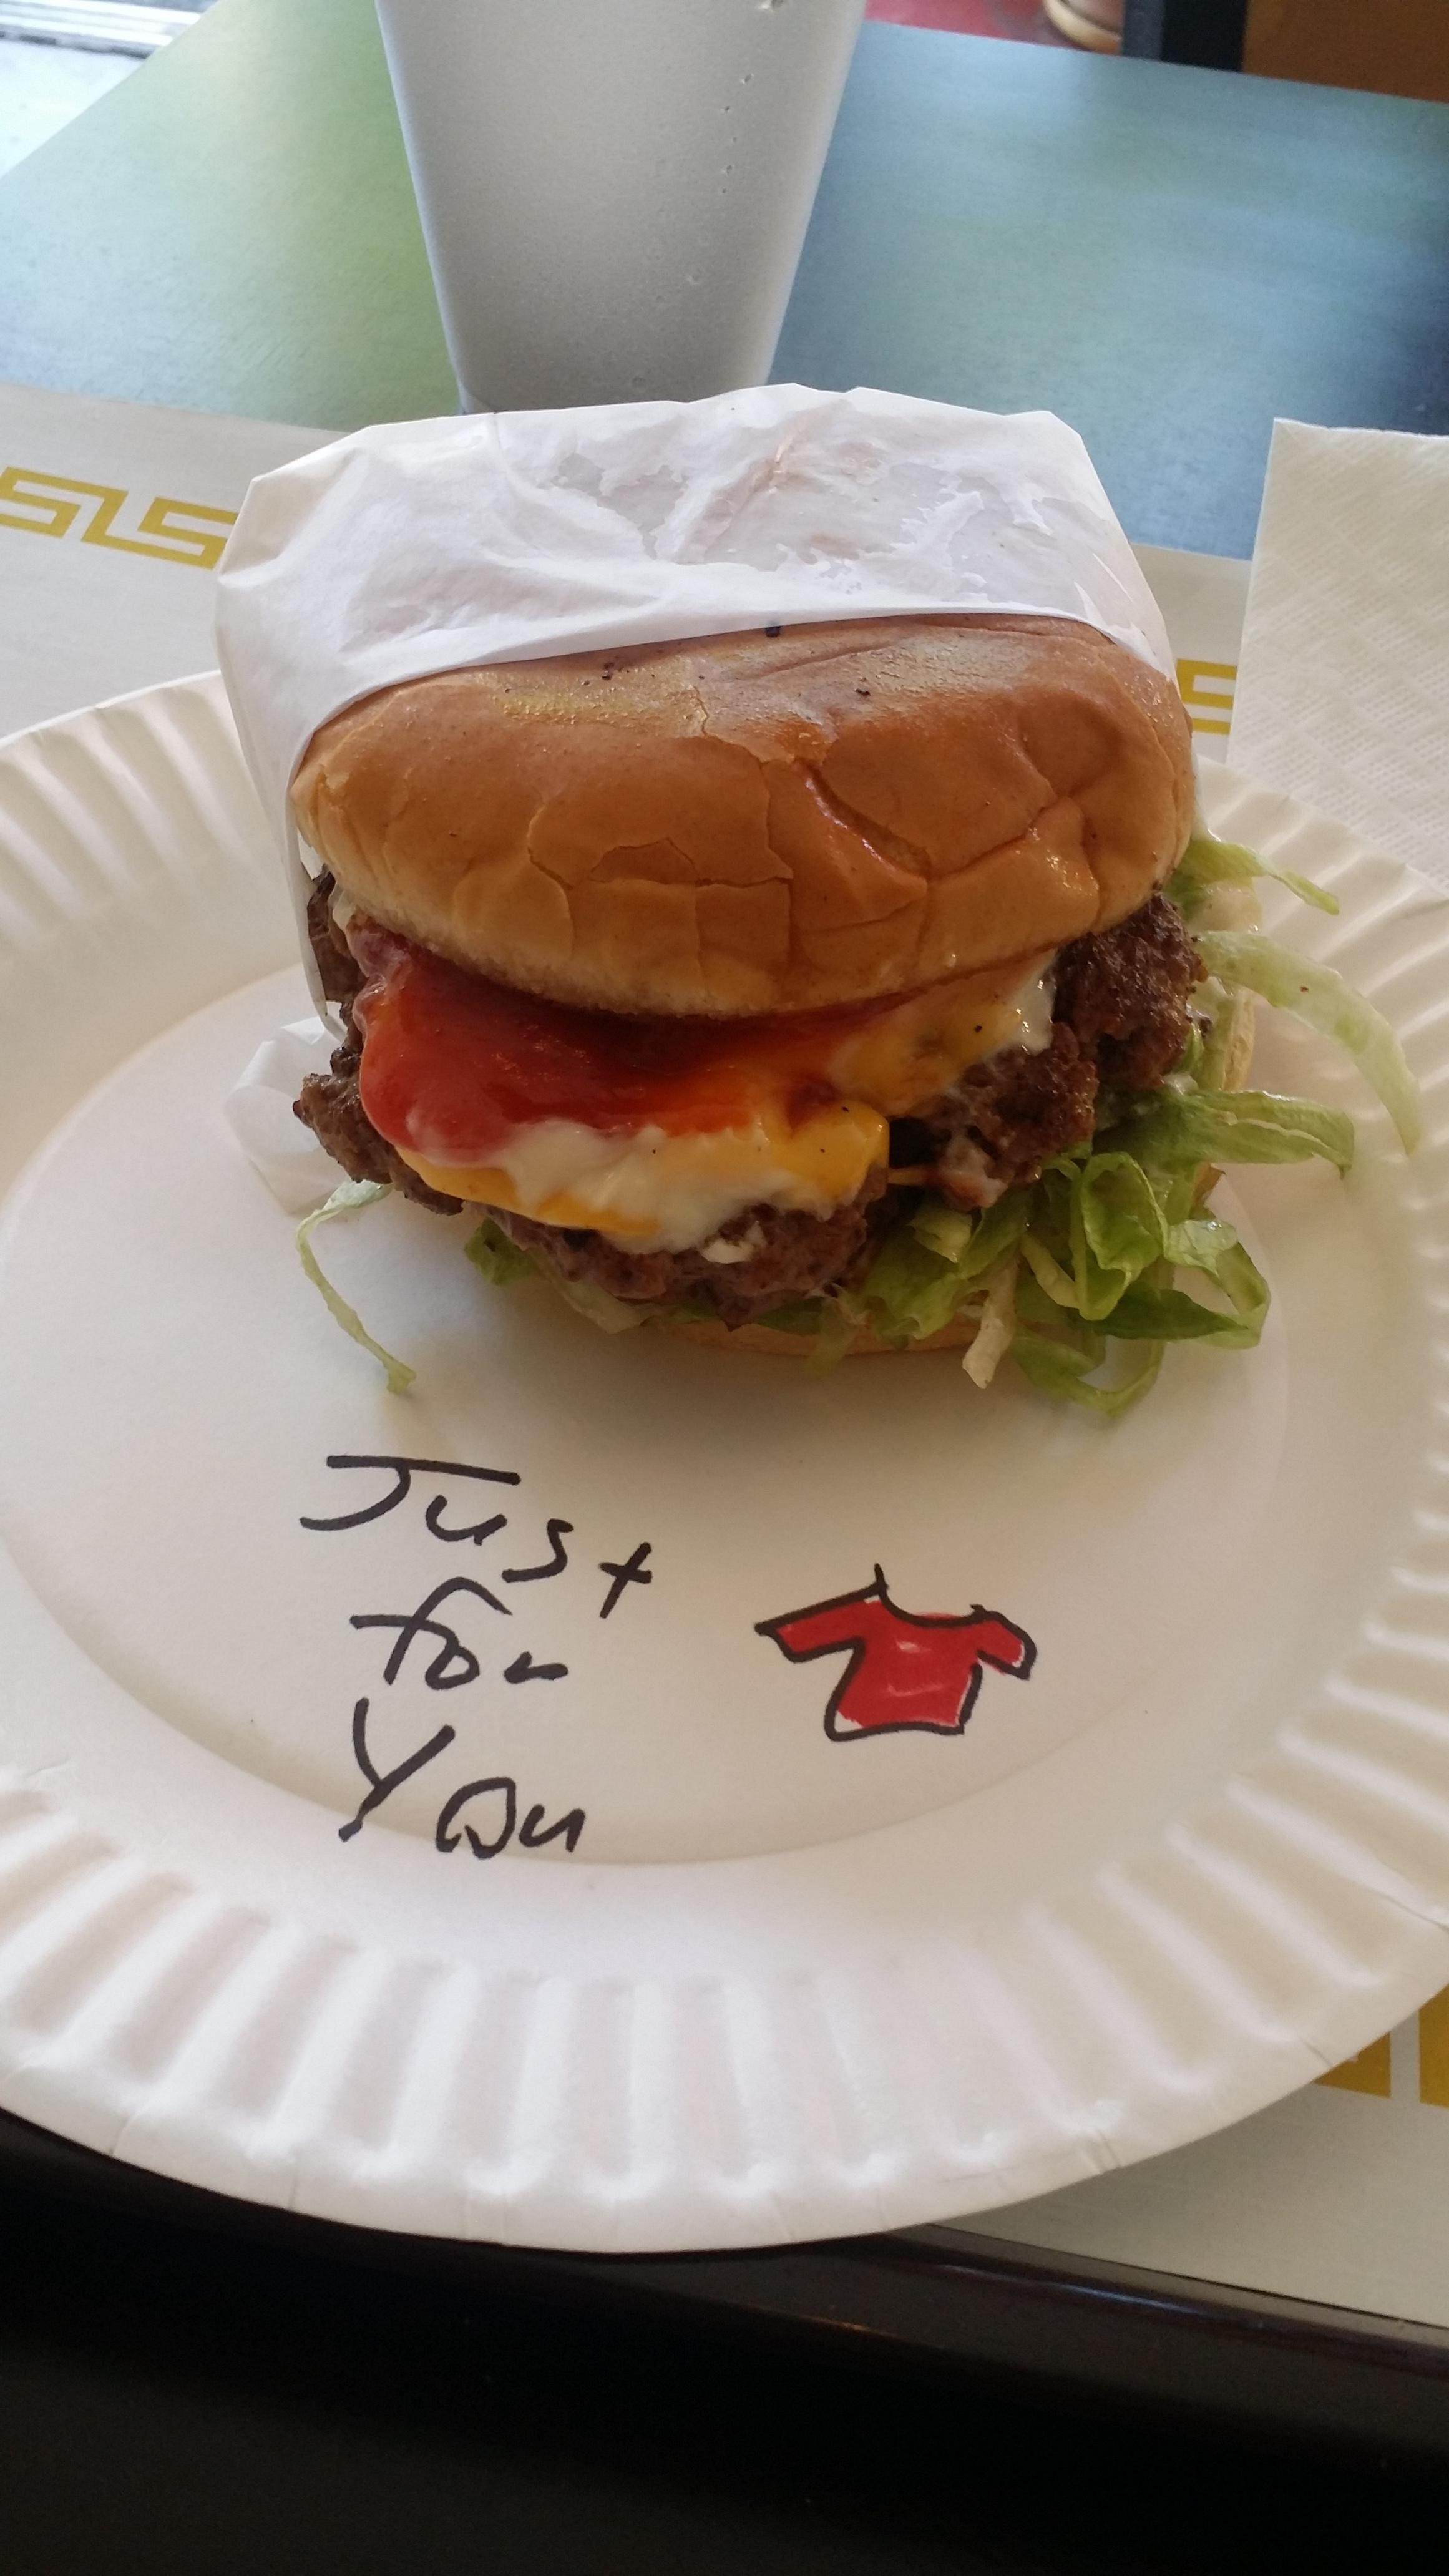 20160416_172230 customer Experience  marketing cx shift user experience business startup entrepreneur Irvs Burger.jpg